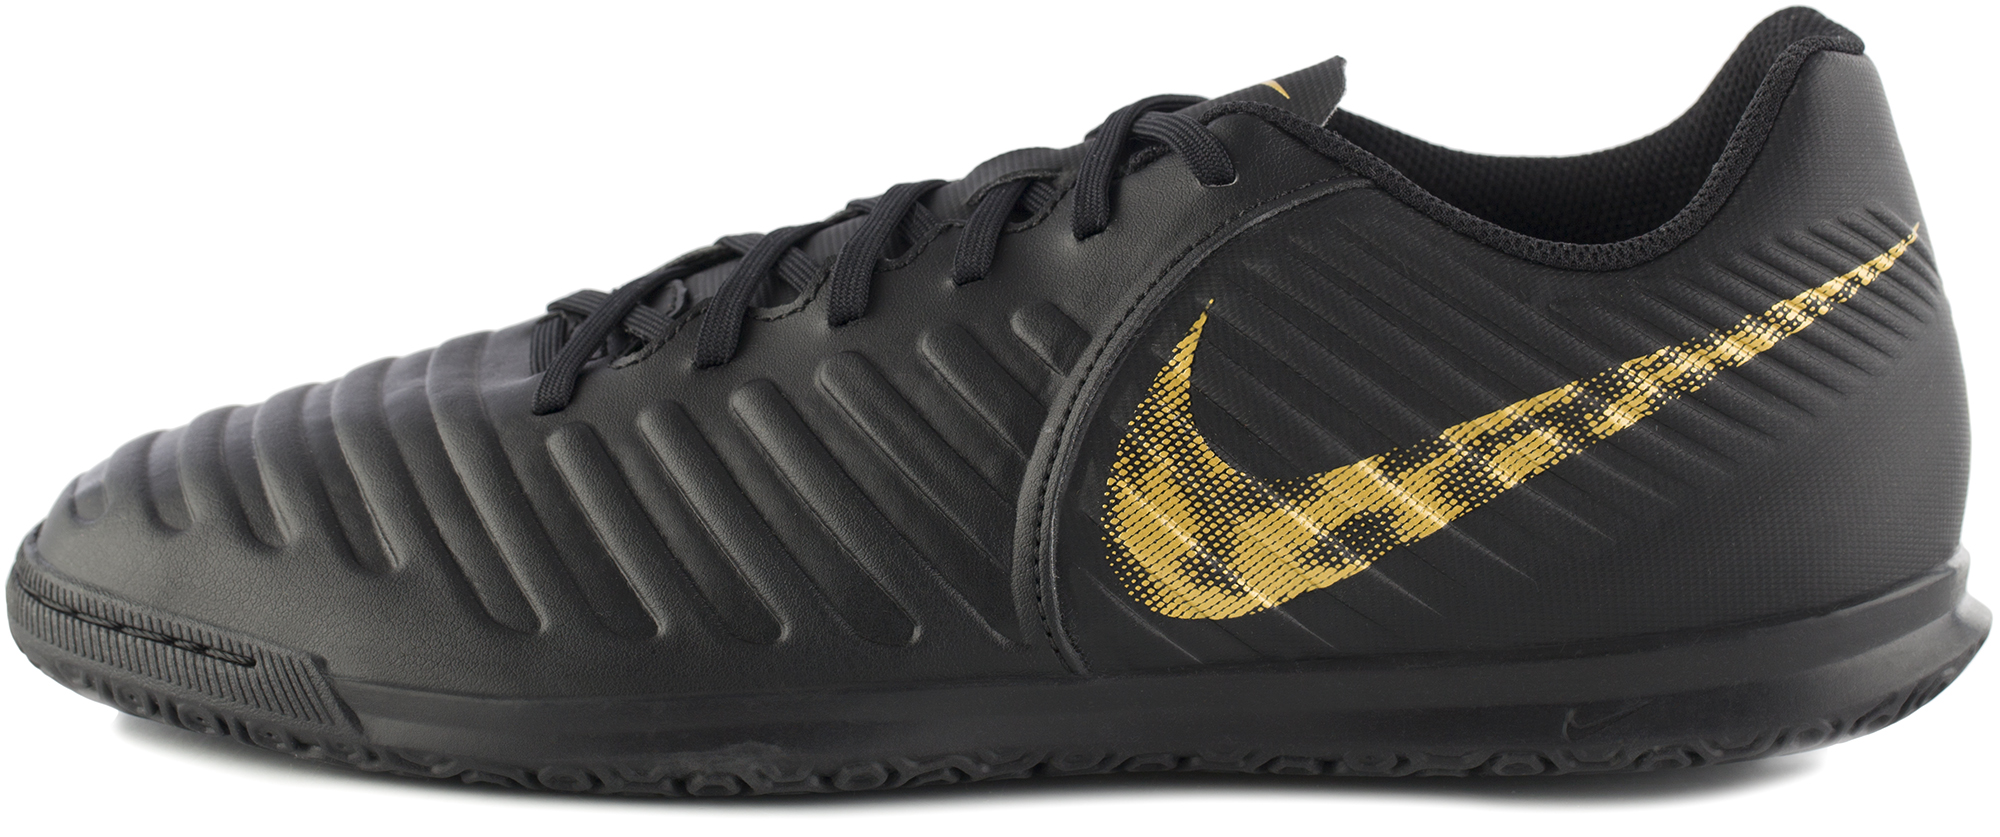 Nike Бутсы мужские Nike Legend 7 Club IC, размер 45